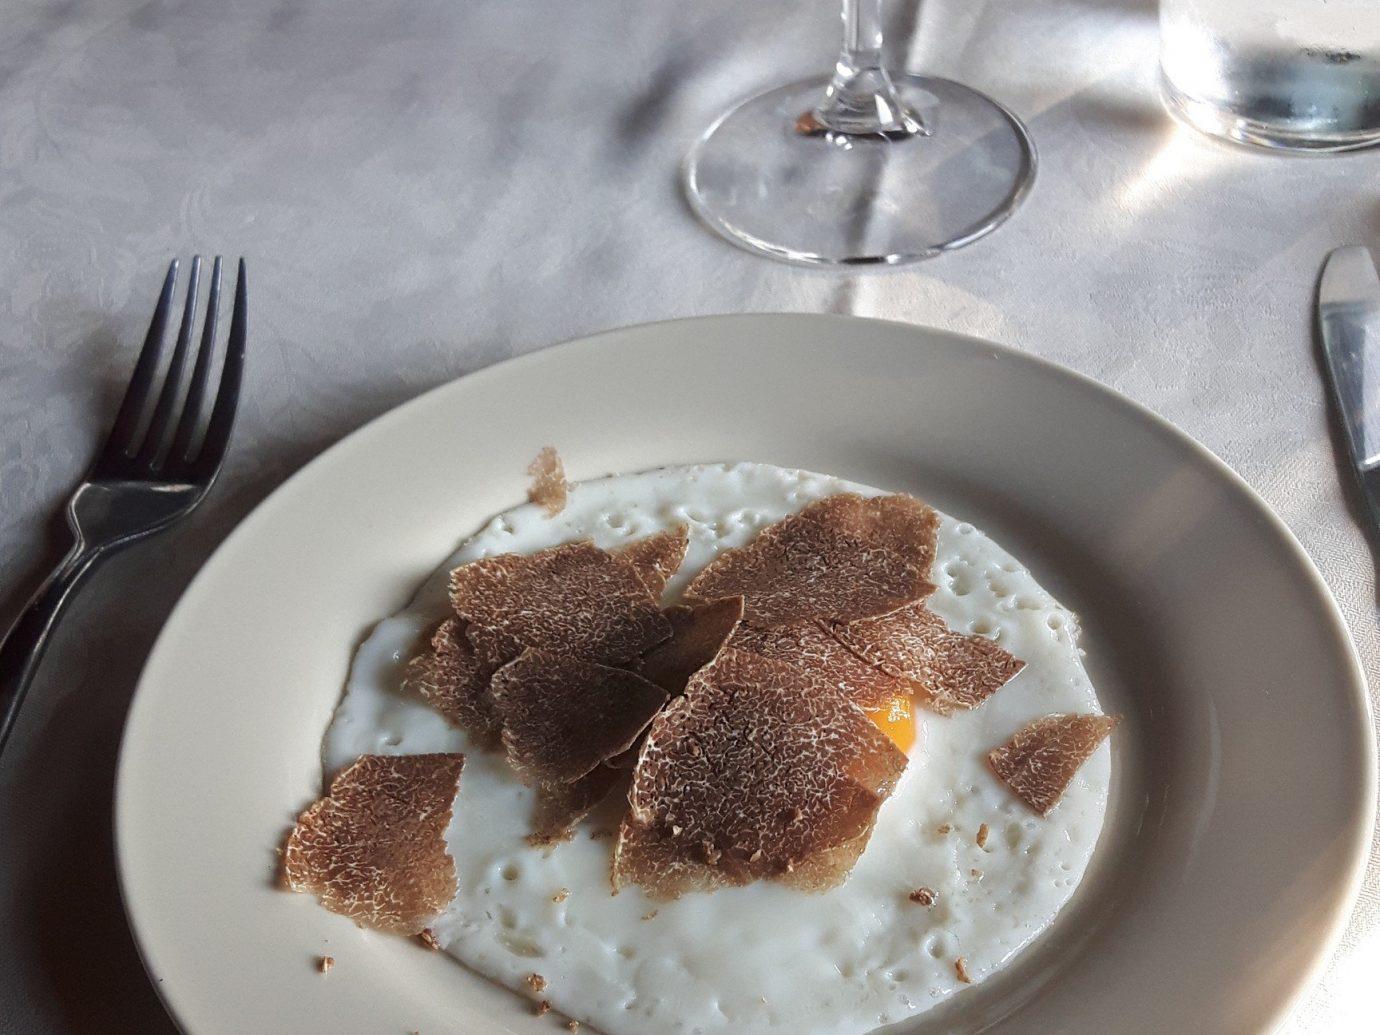 Pasta dish with truffles